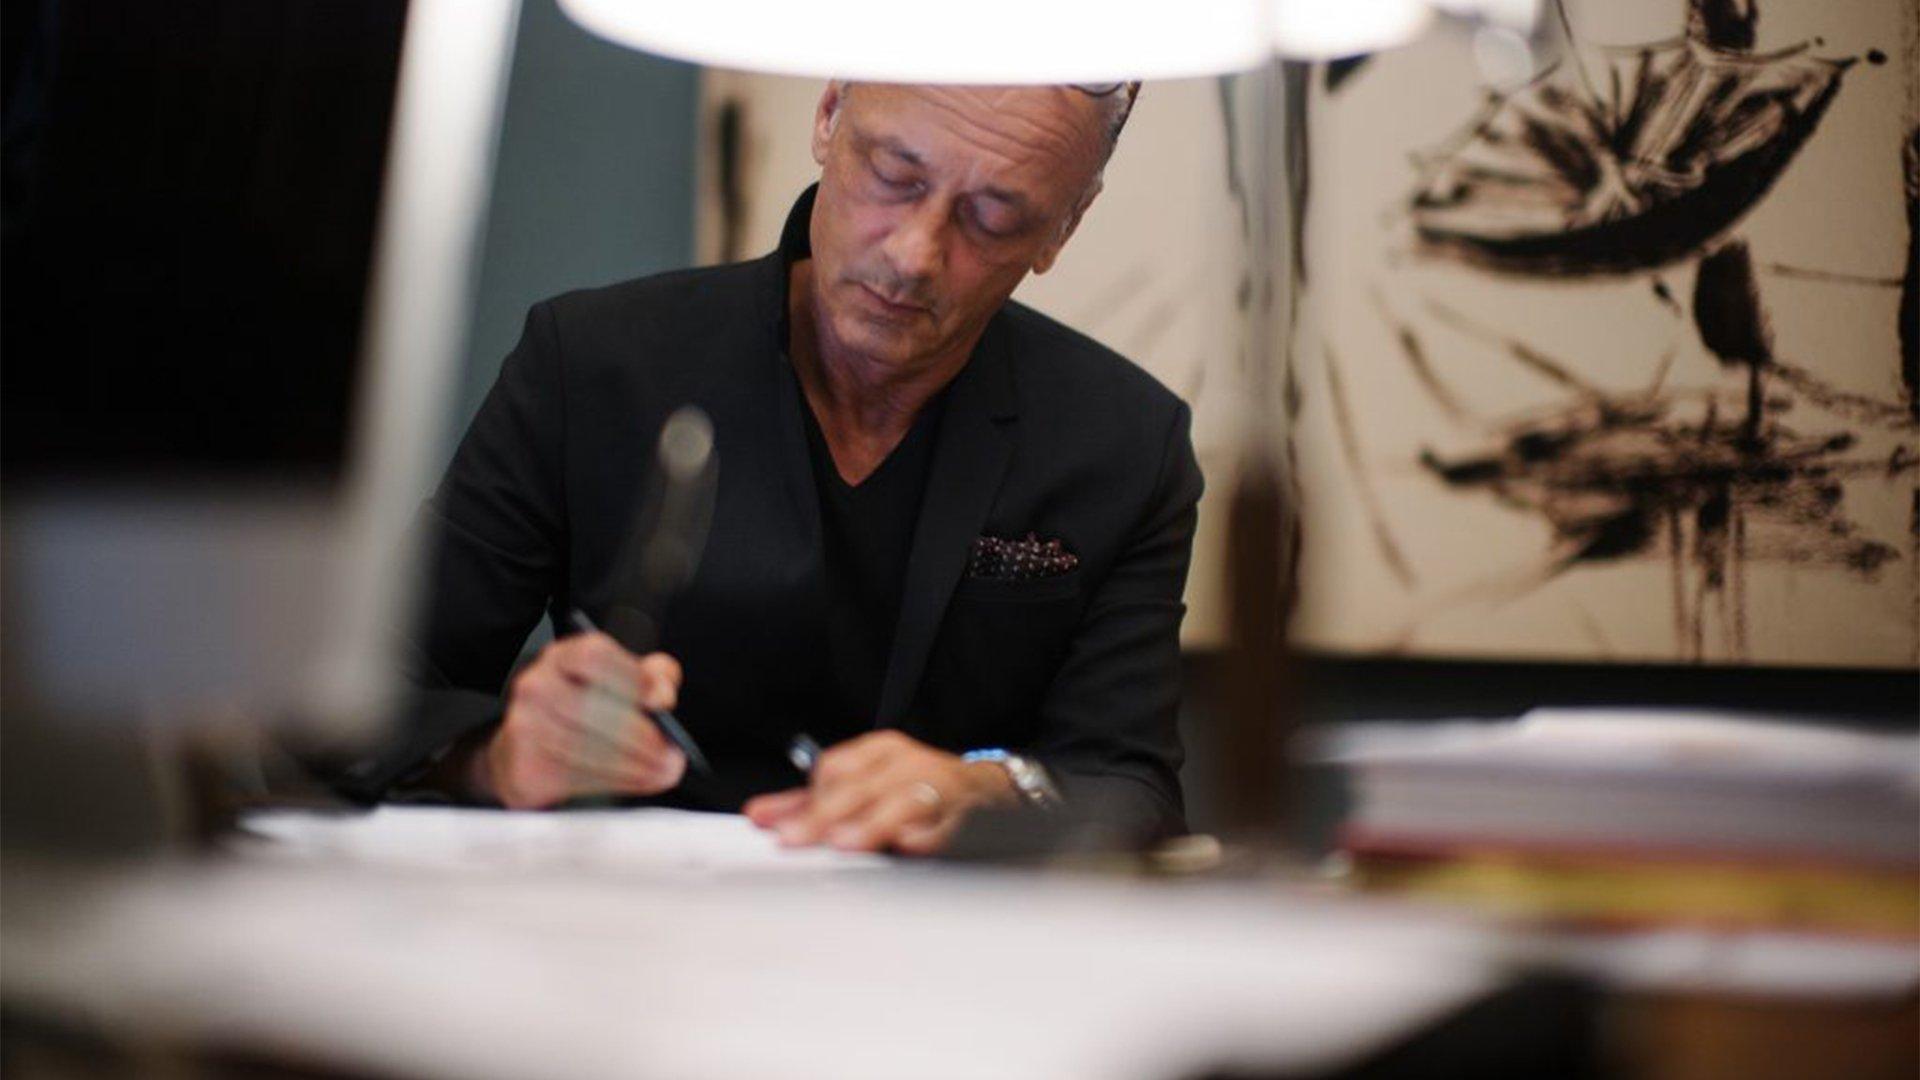 Italian Illustrator Andrea Ferolla doing a drawing